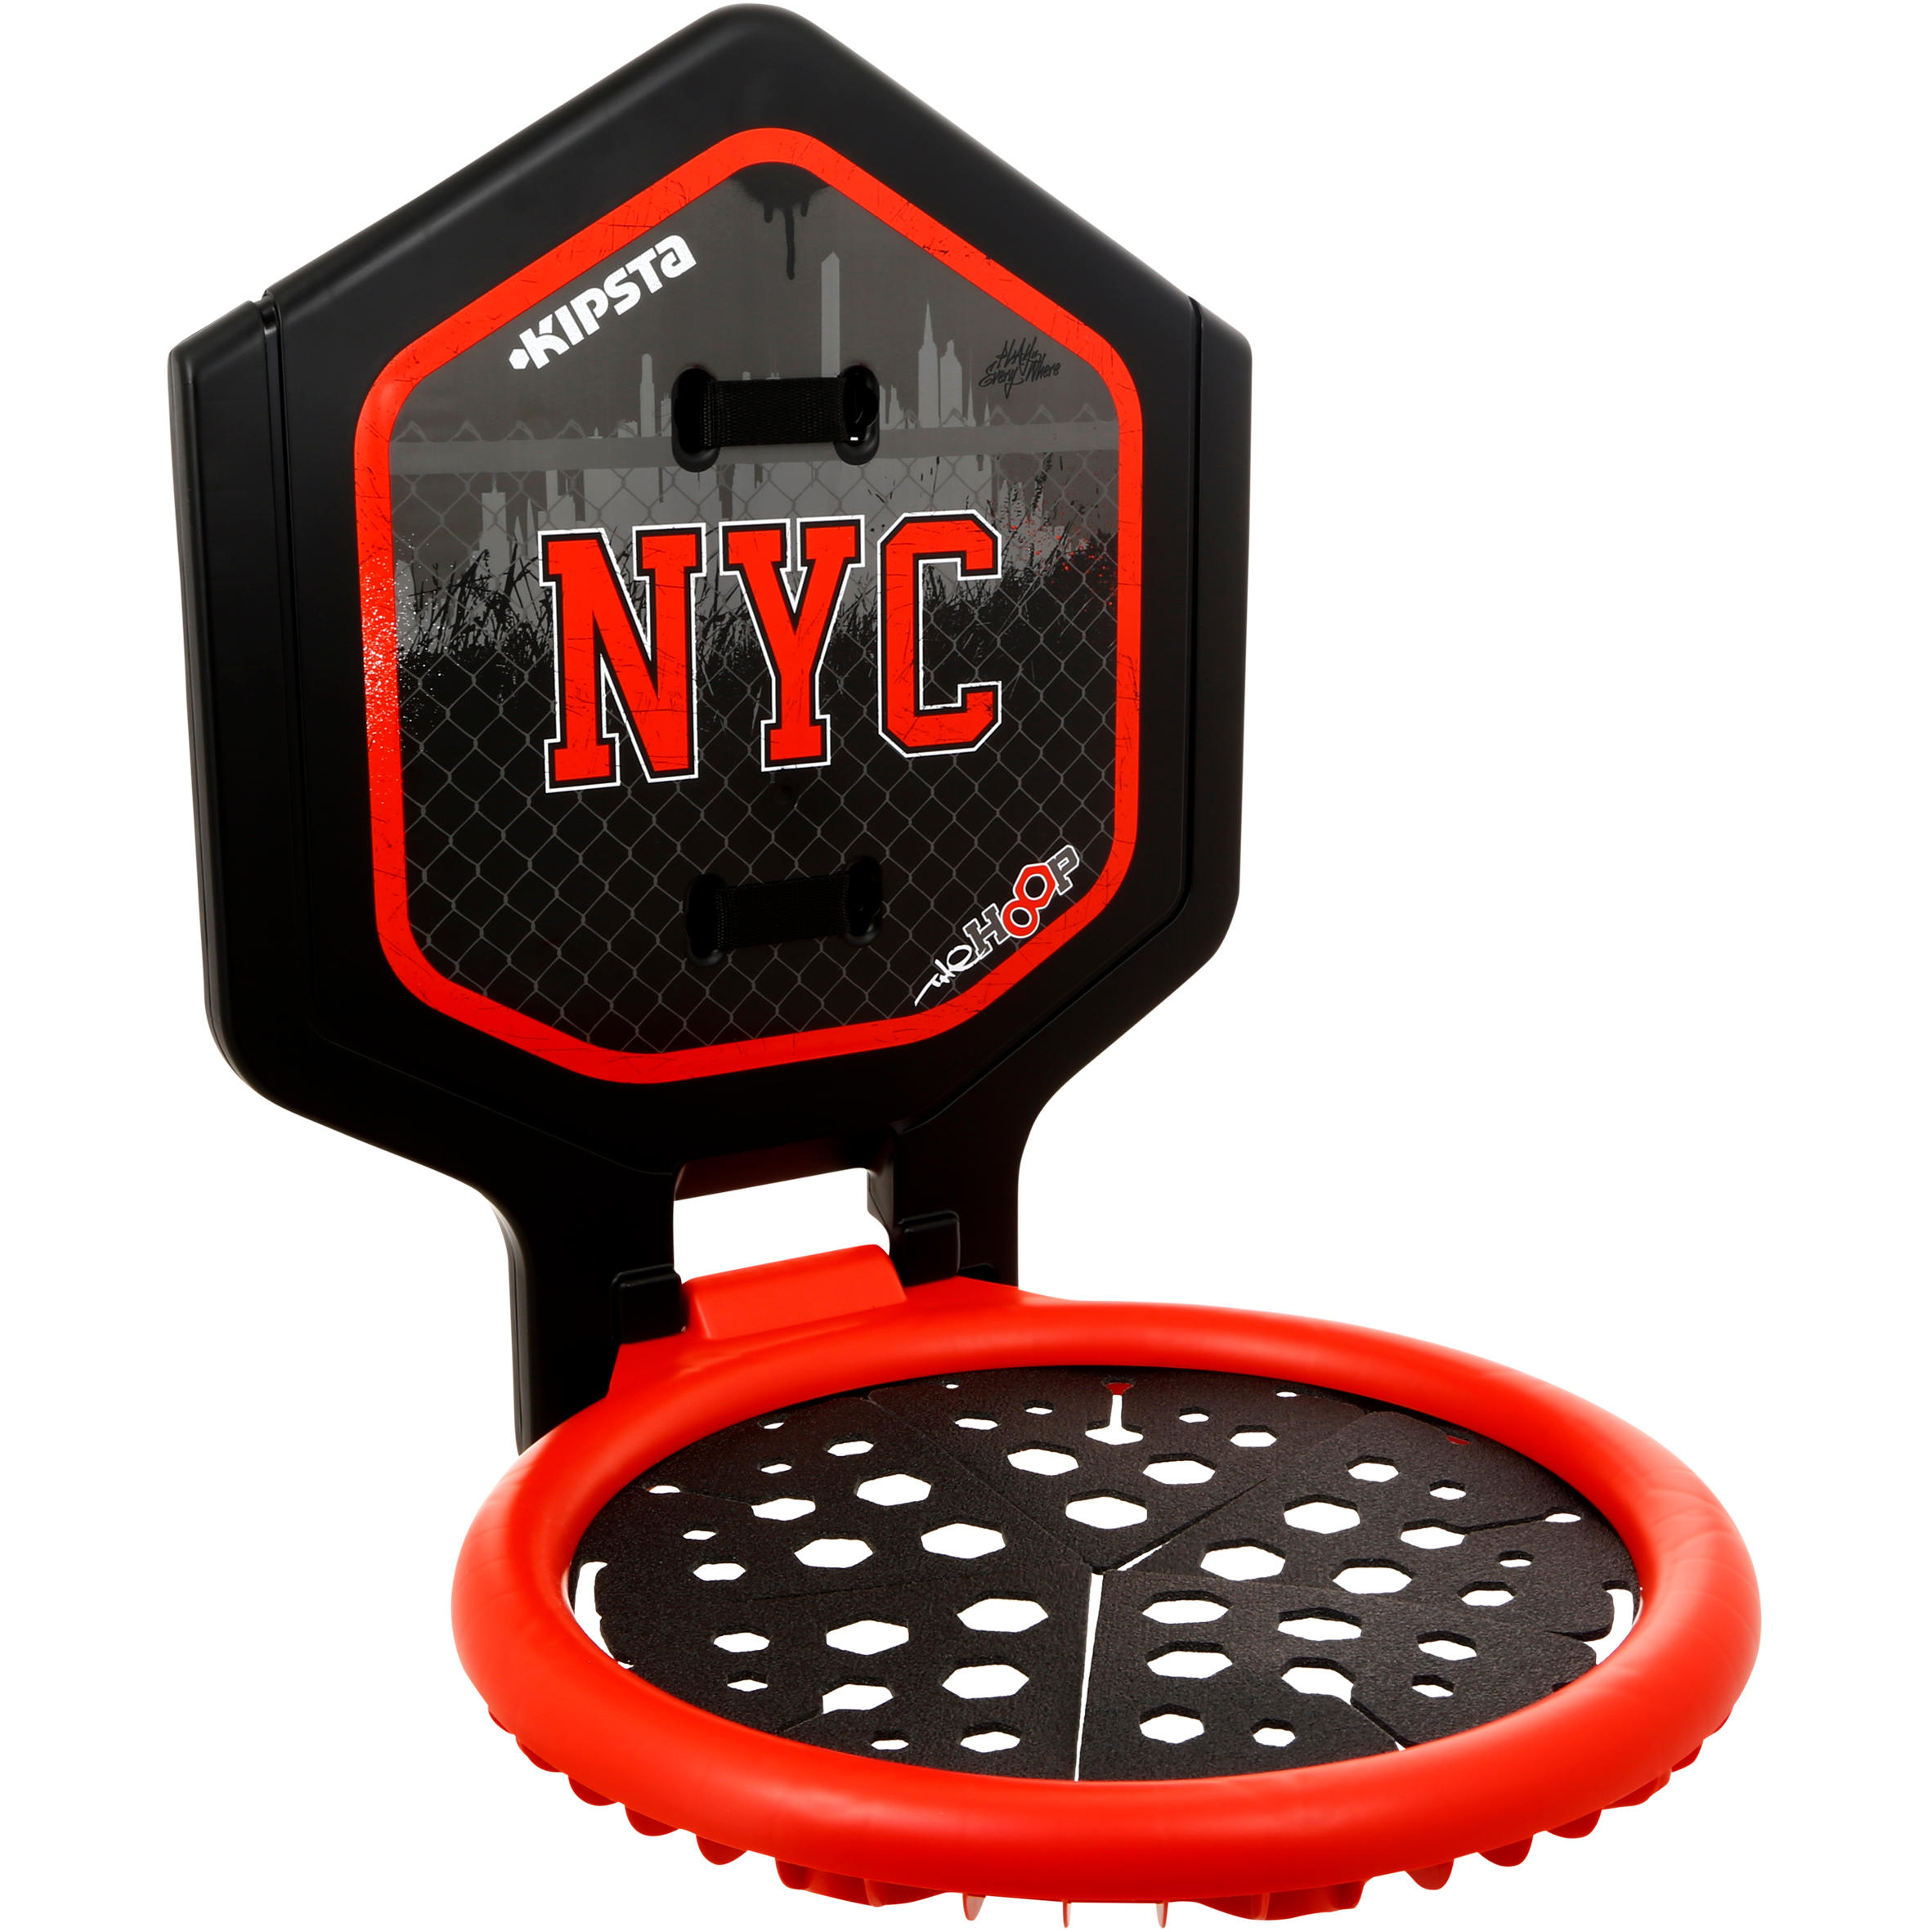 Tarmak Basketbalbord The Hoop